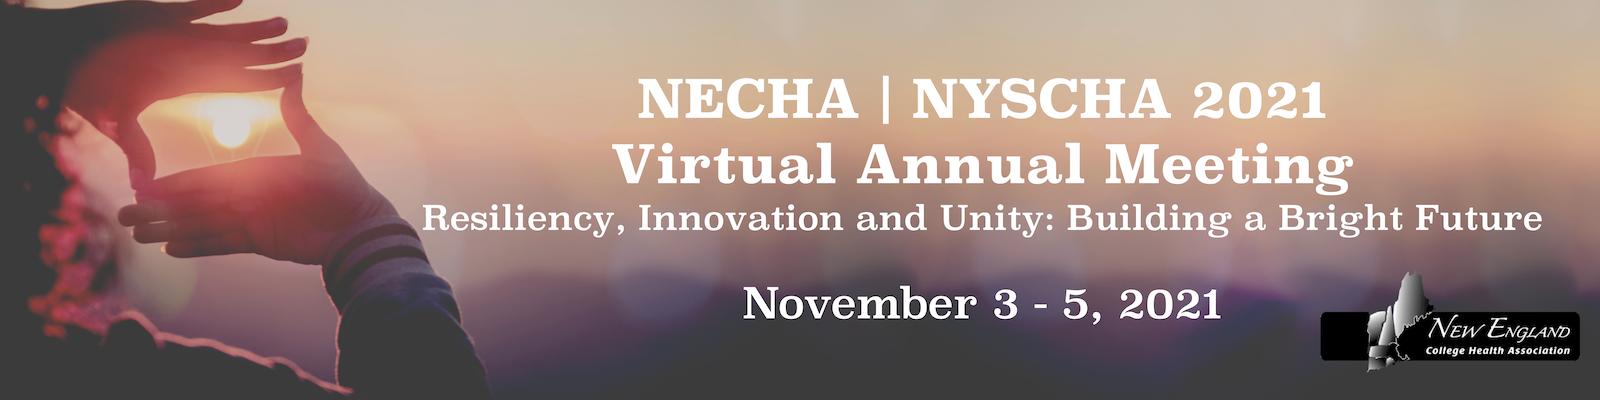 NECHA 2021 Web Banner CFP Virtual